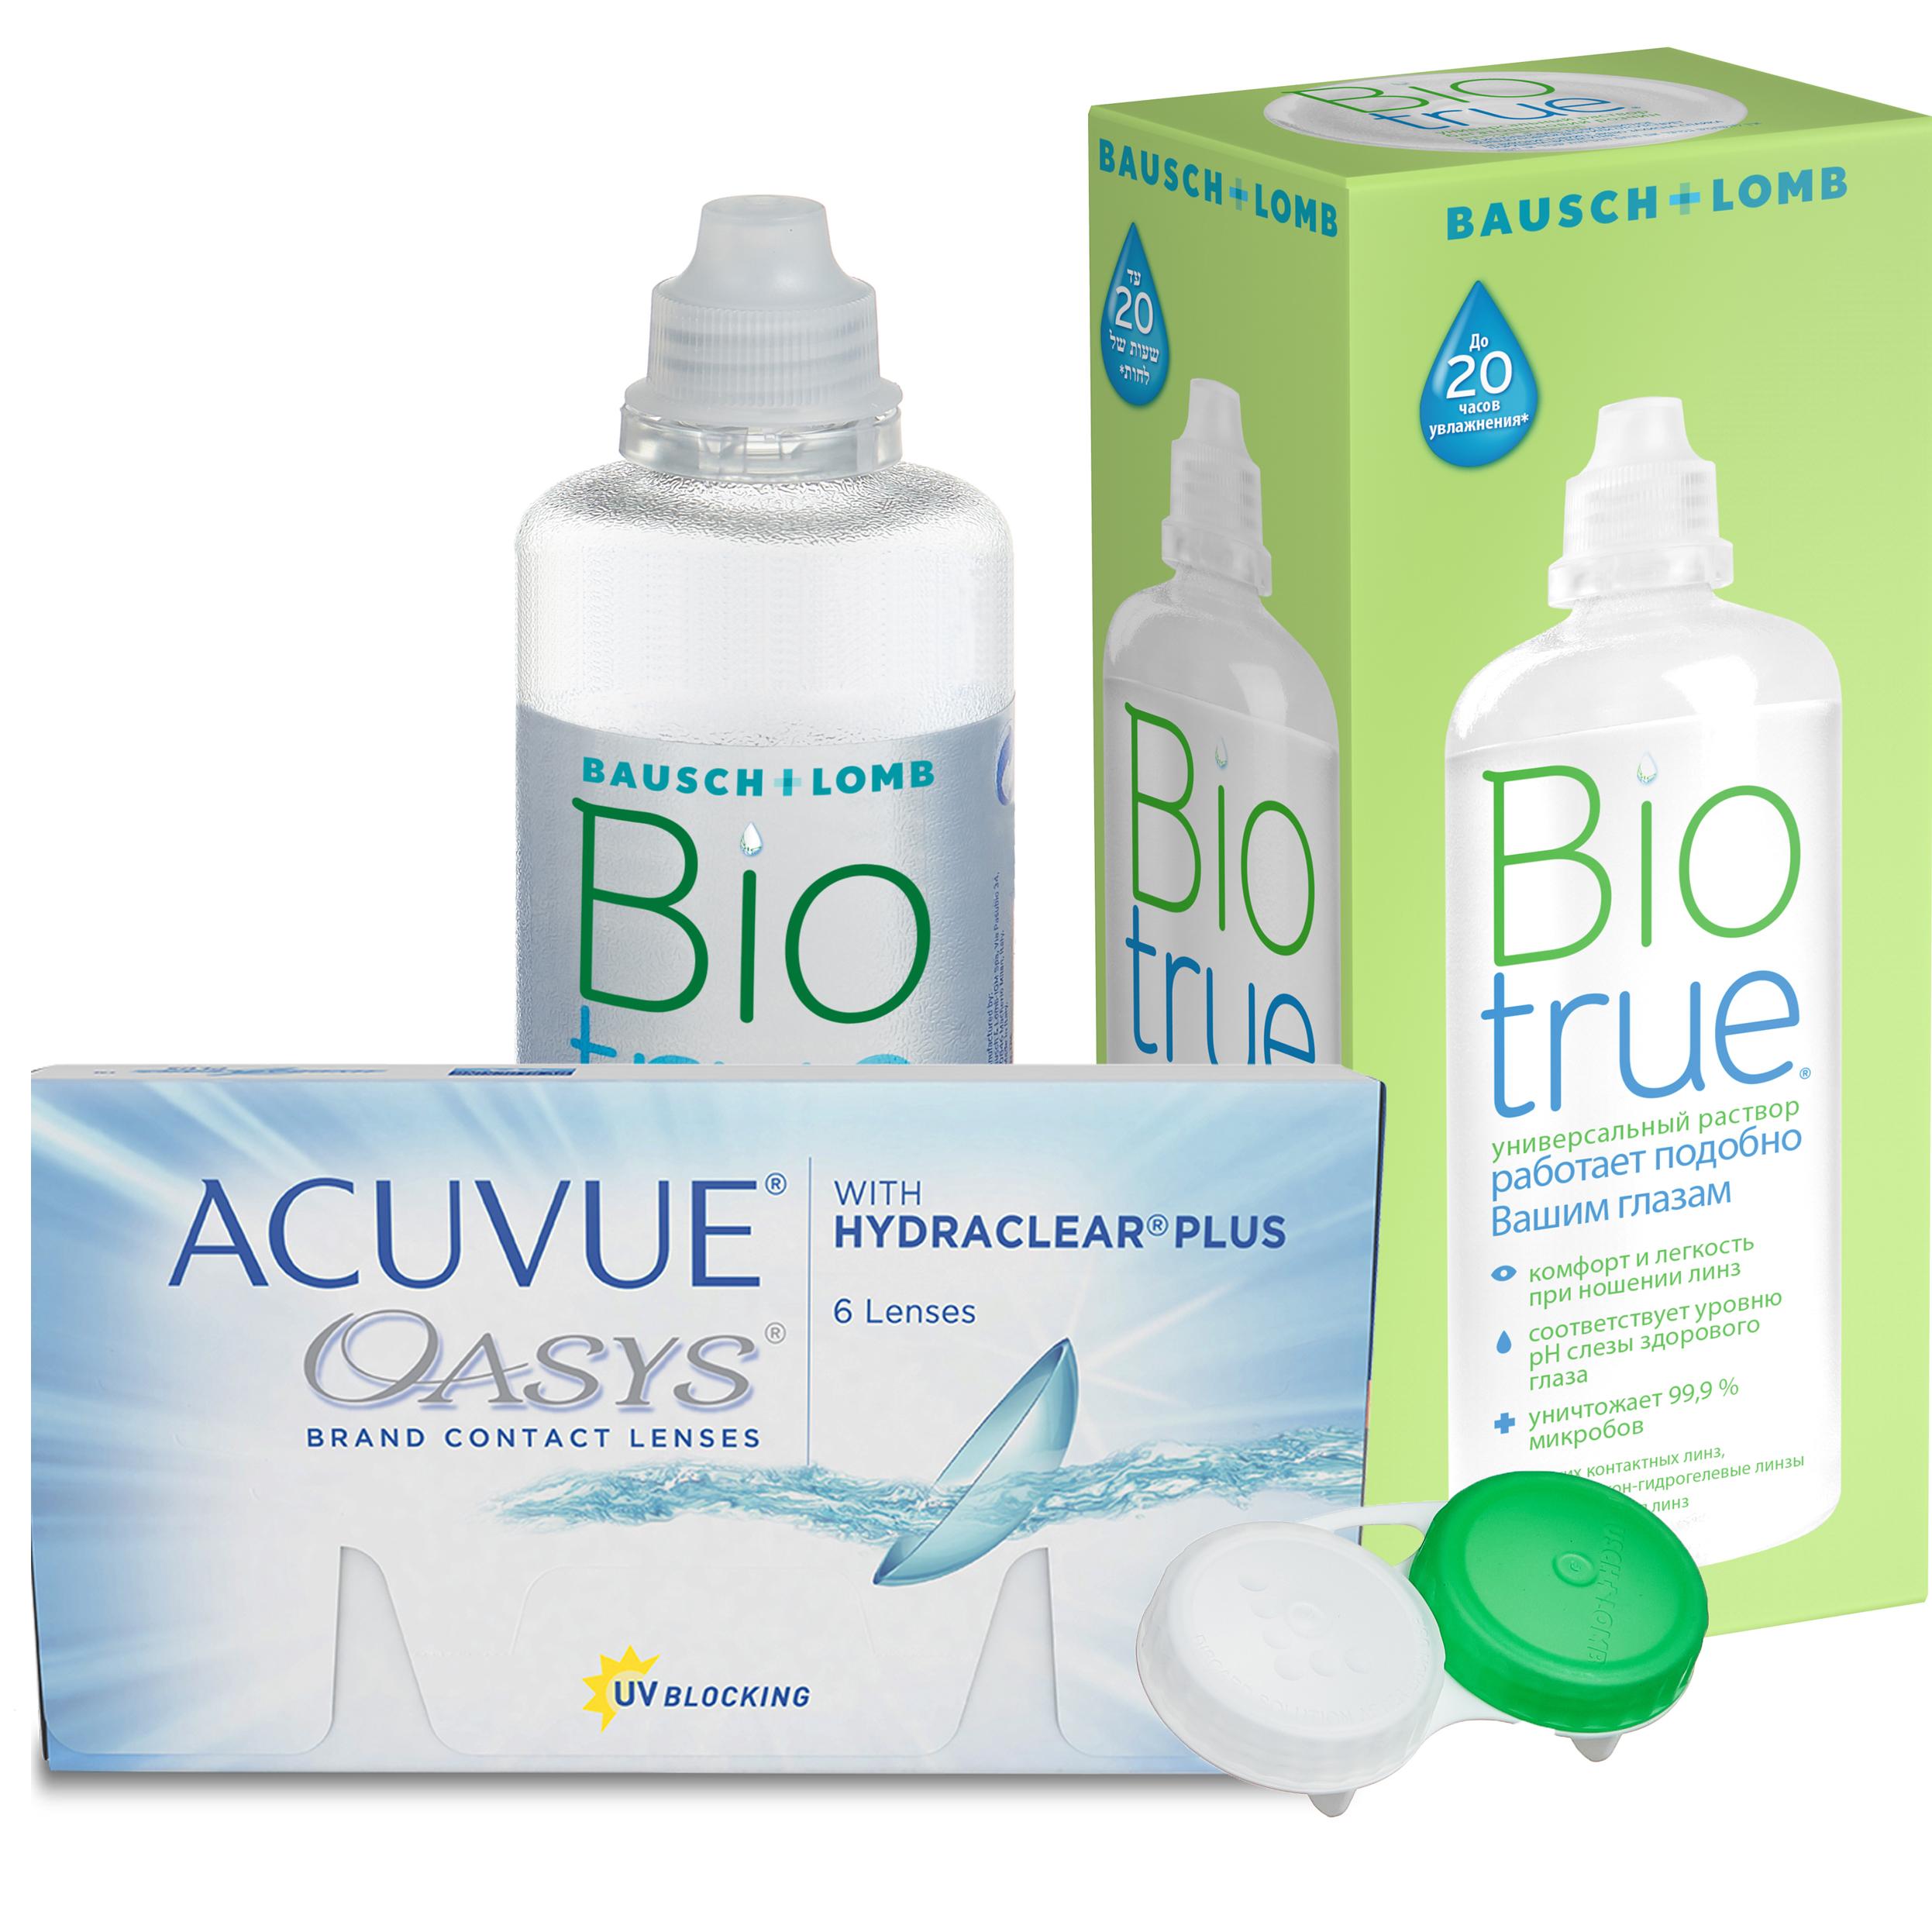 Купить Oasys with Hydraclear Plus 6 линз + Biotrue, Контактные линзы Acuvue Oasys with Hydraclear Plus 6 линз R 8.8 -5, 25 + Biotrue 300 мл